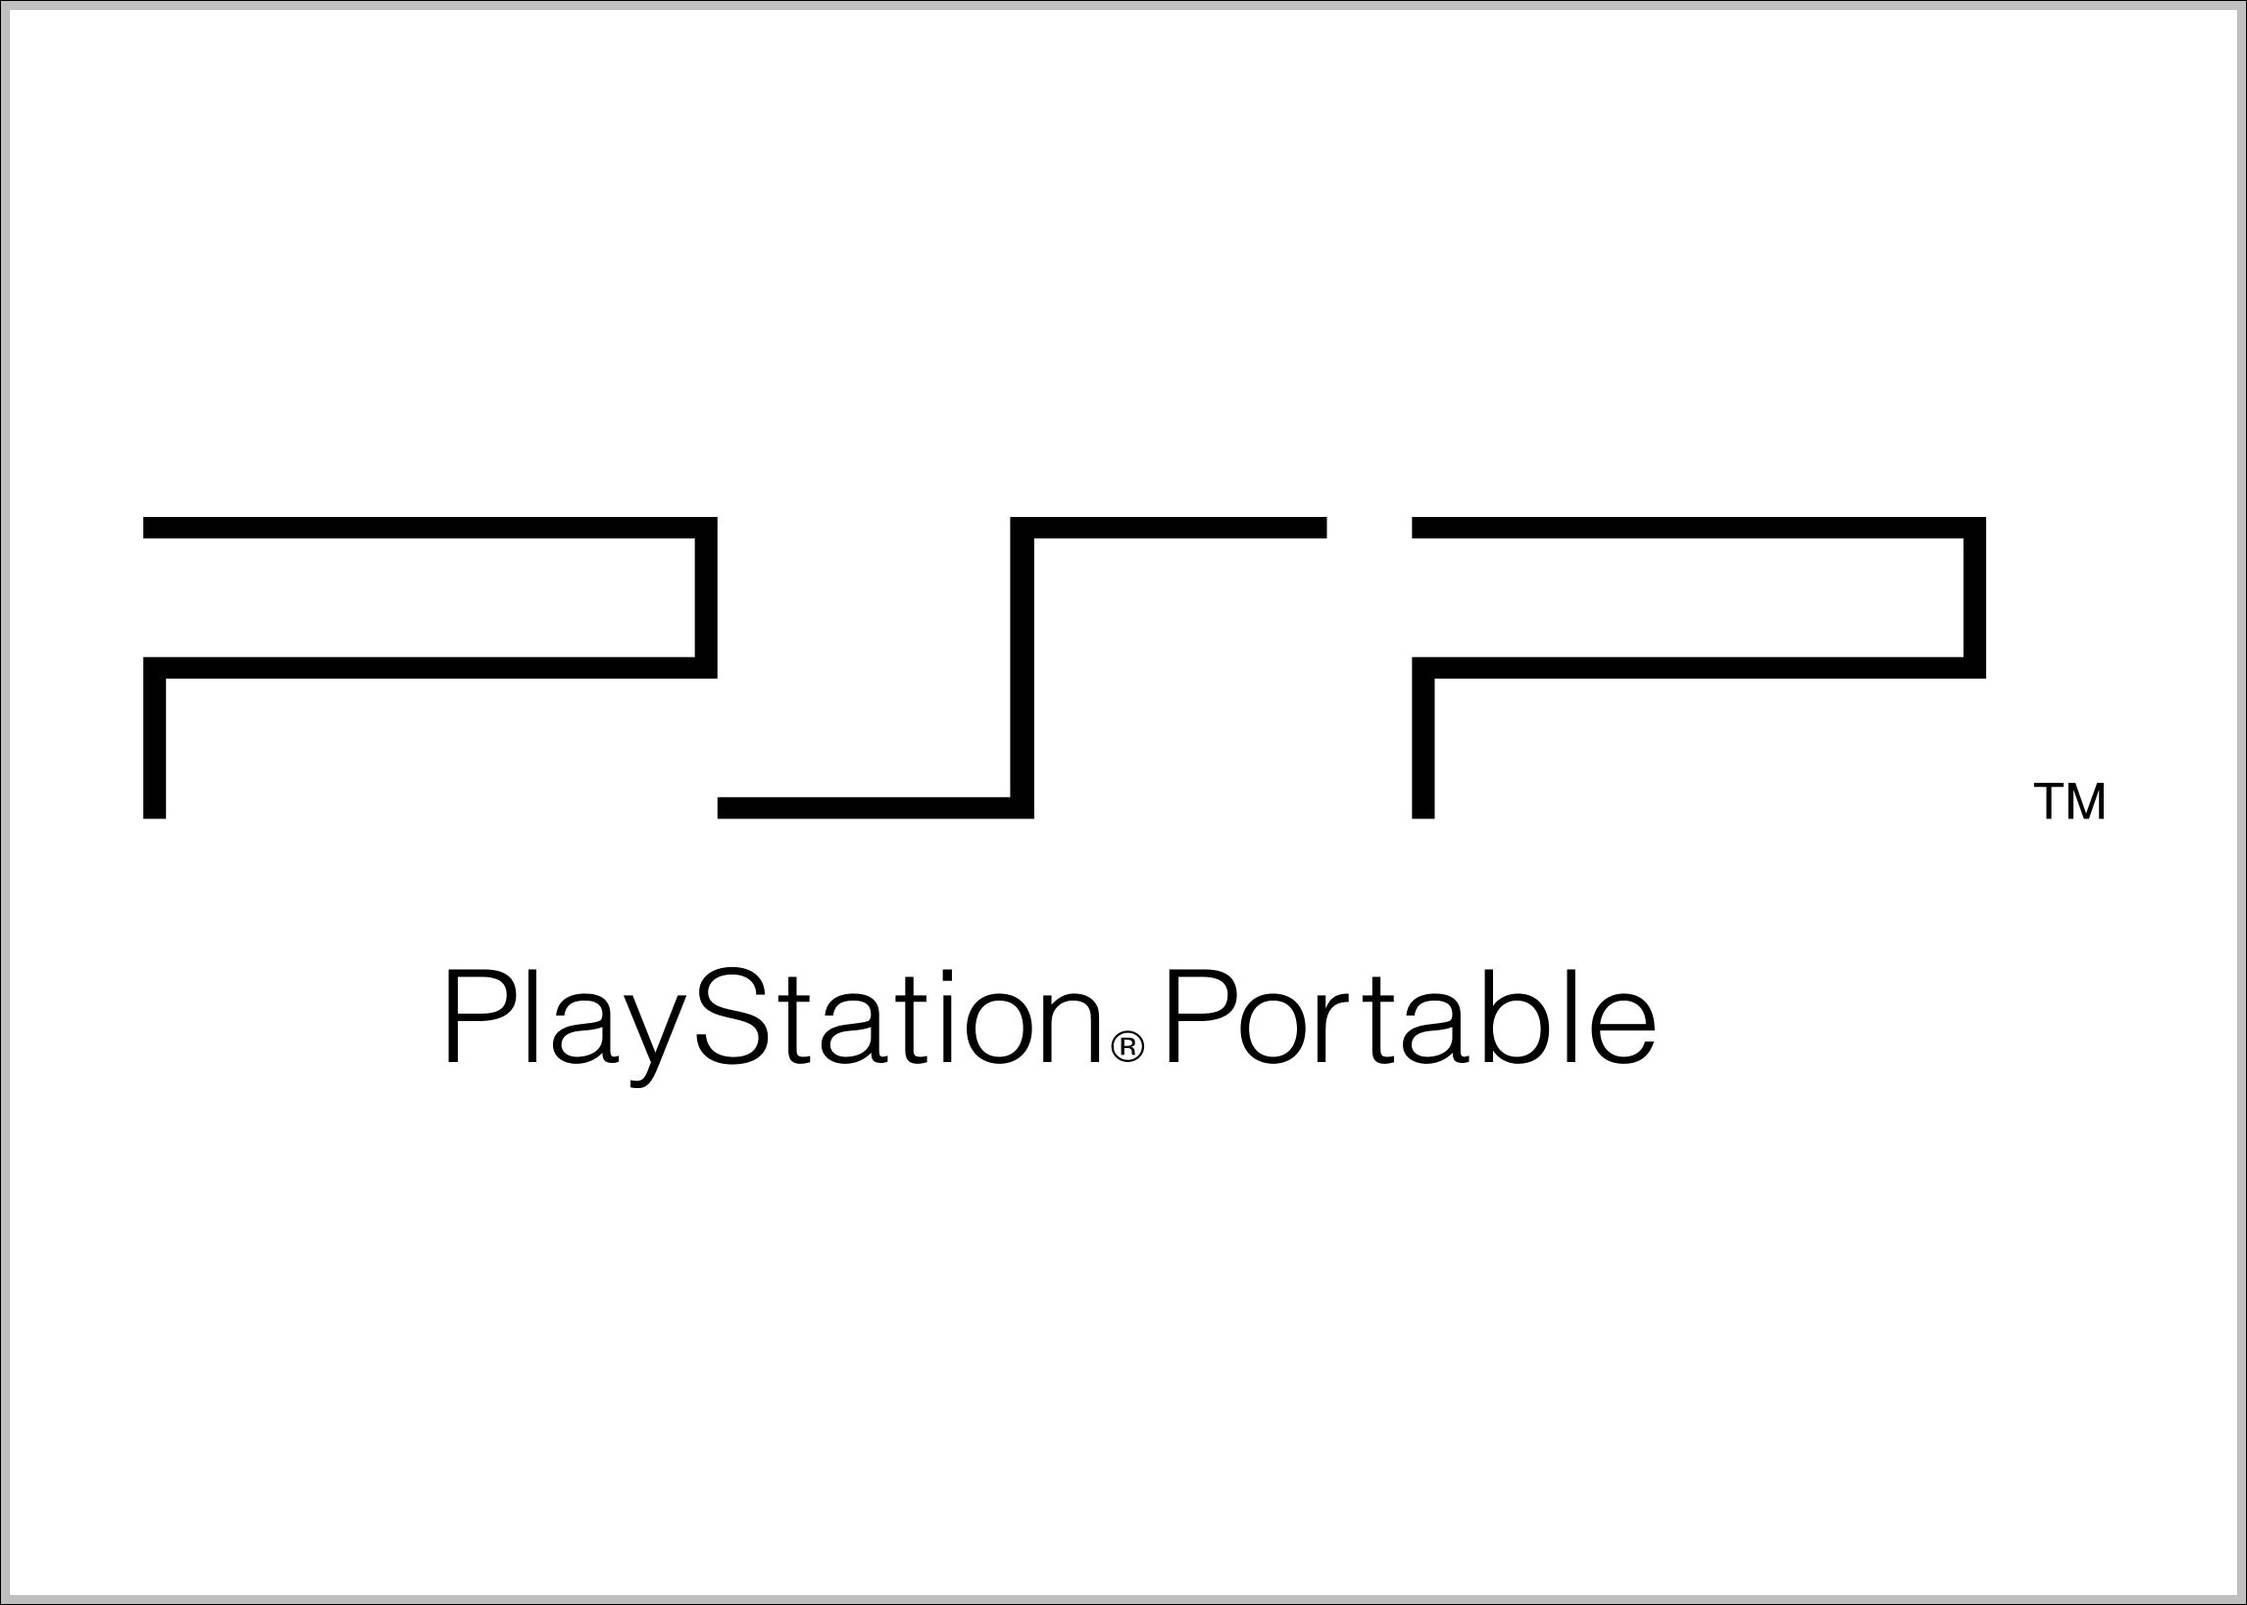 PSP logo PlayStation Portable logo